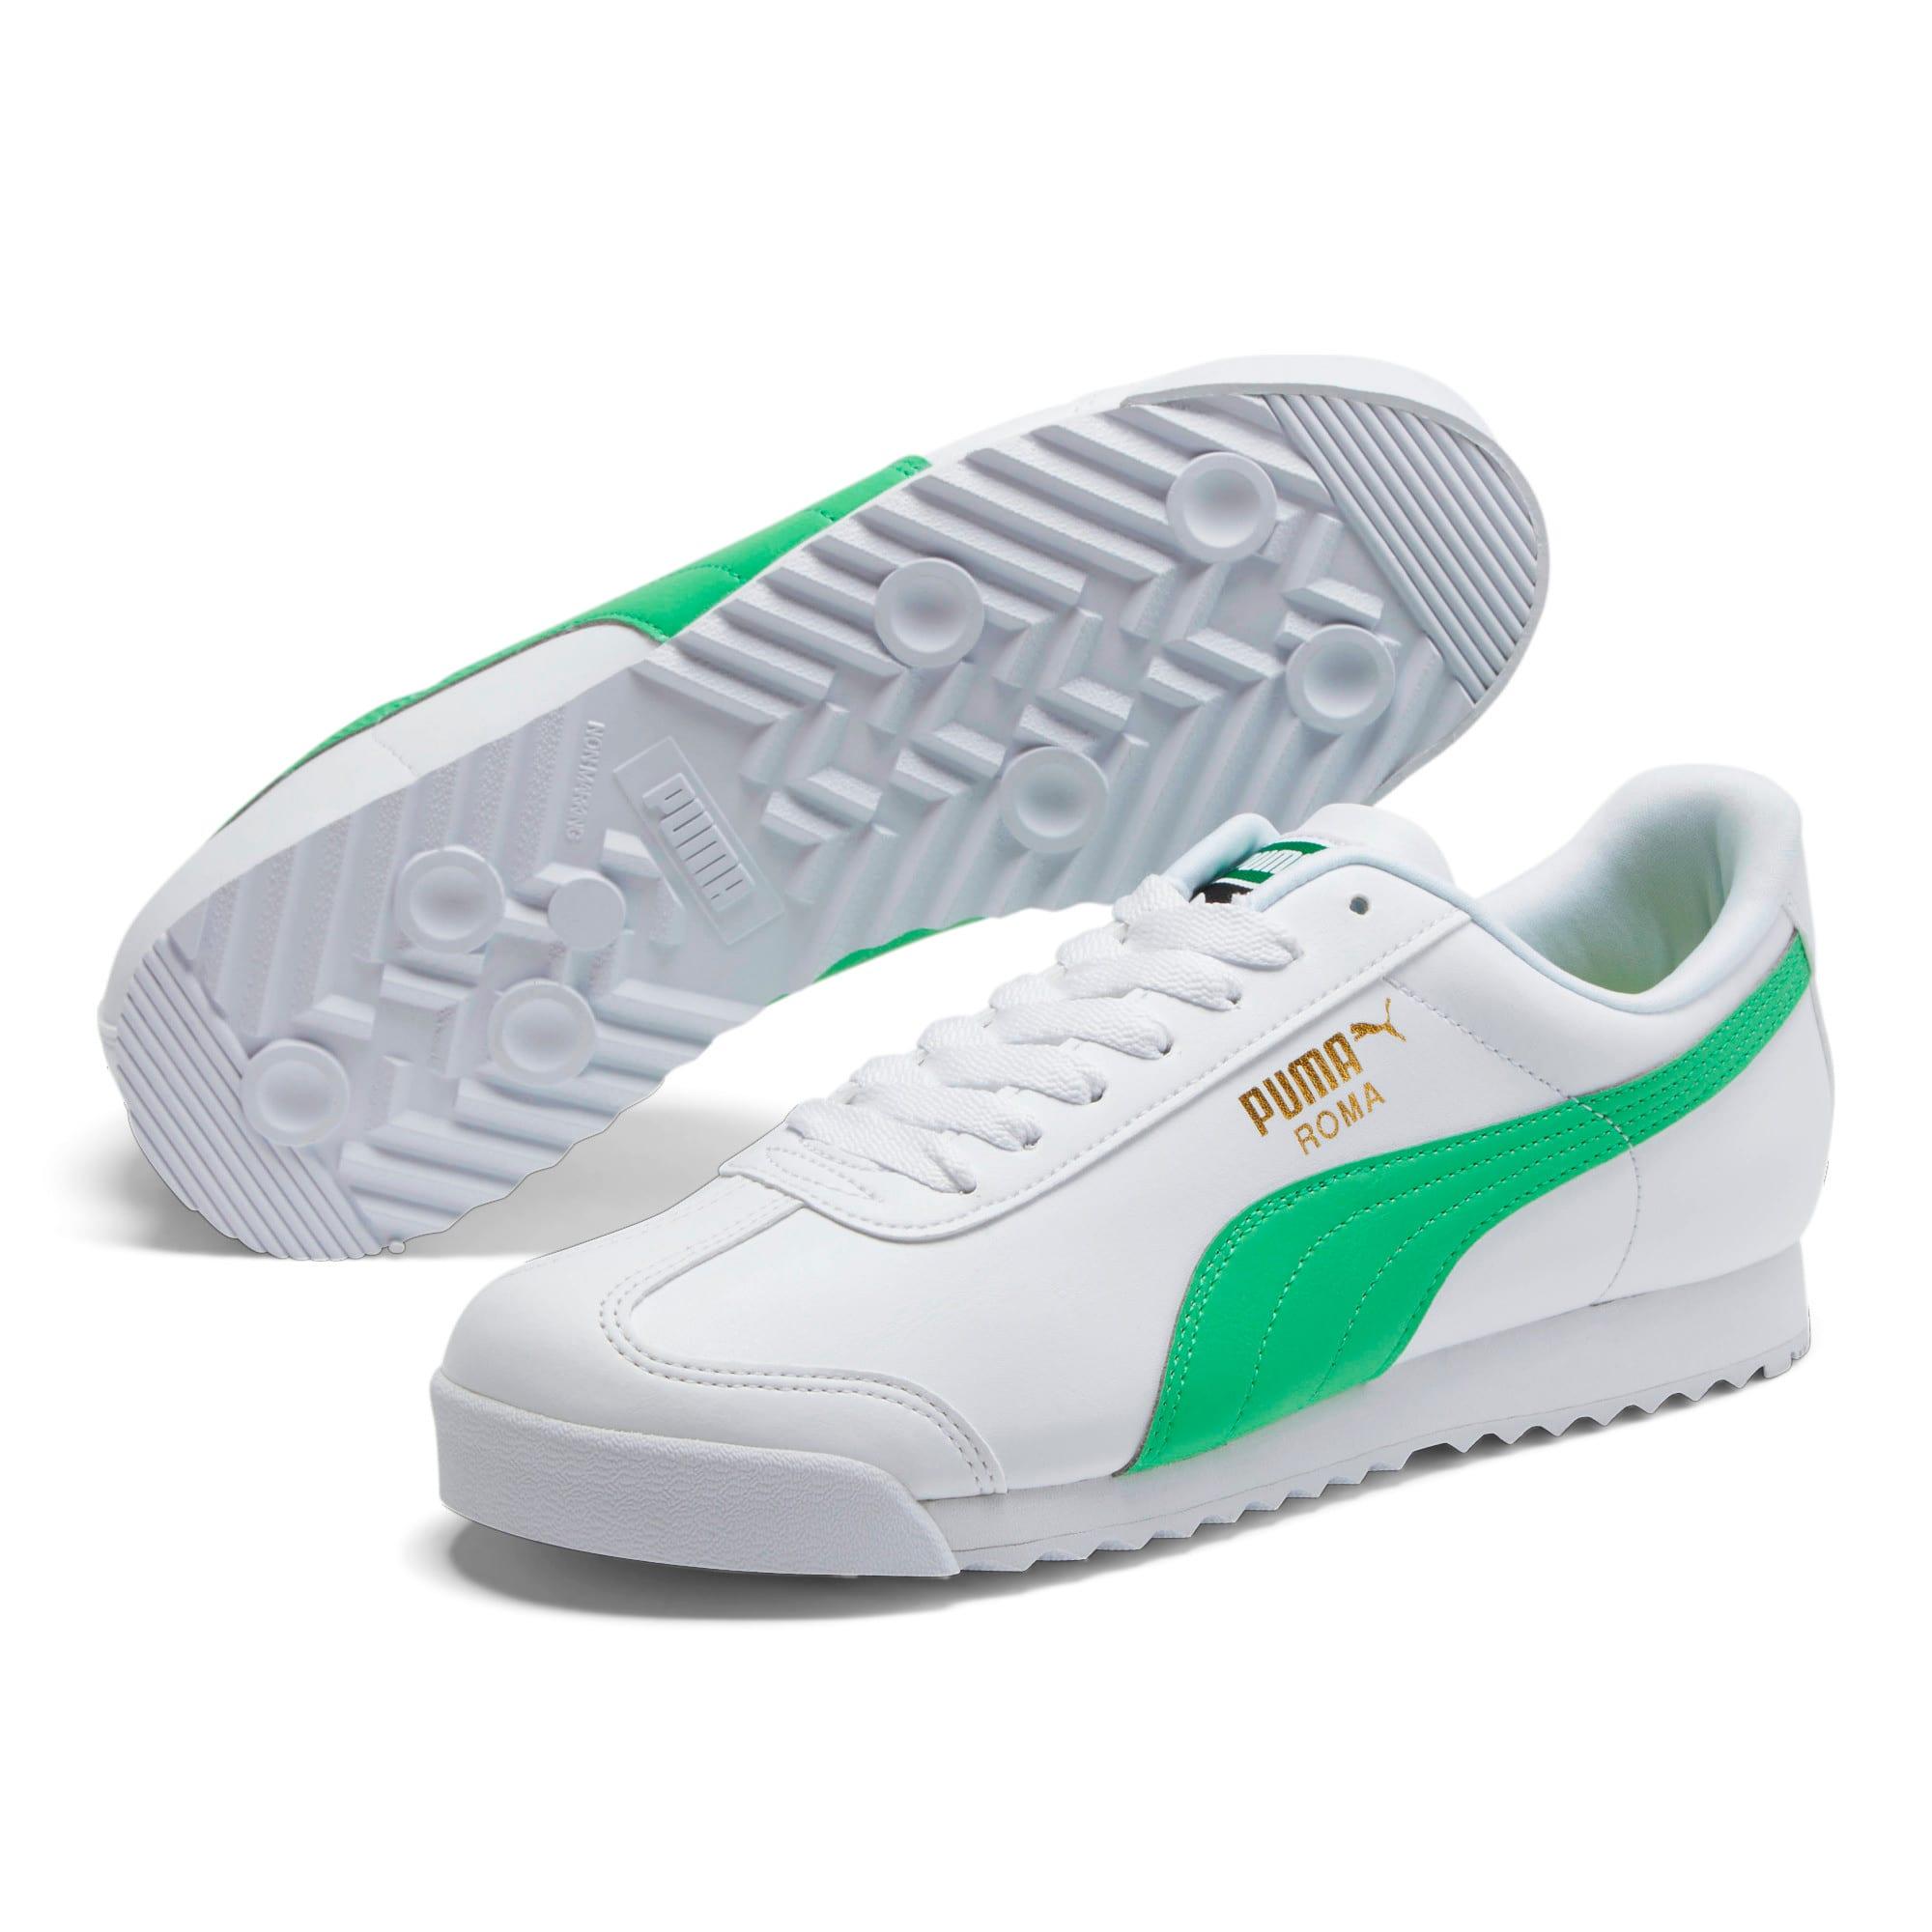 Miniatura 2 de Zapatos deportivos Roma Basic +, Puma White-Irish Green, mediano